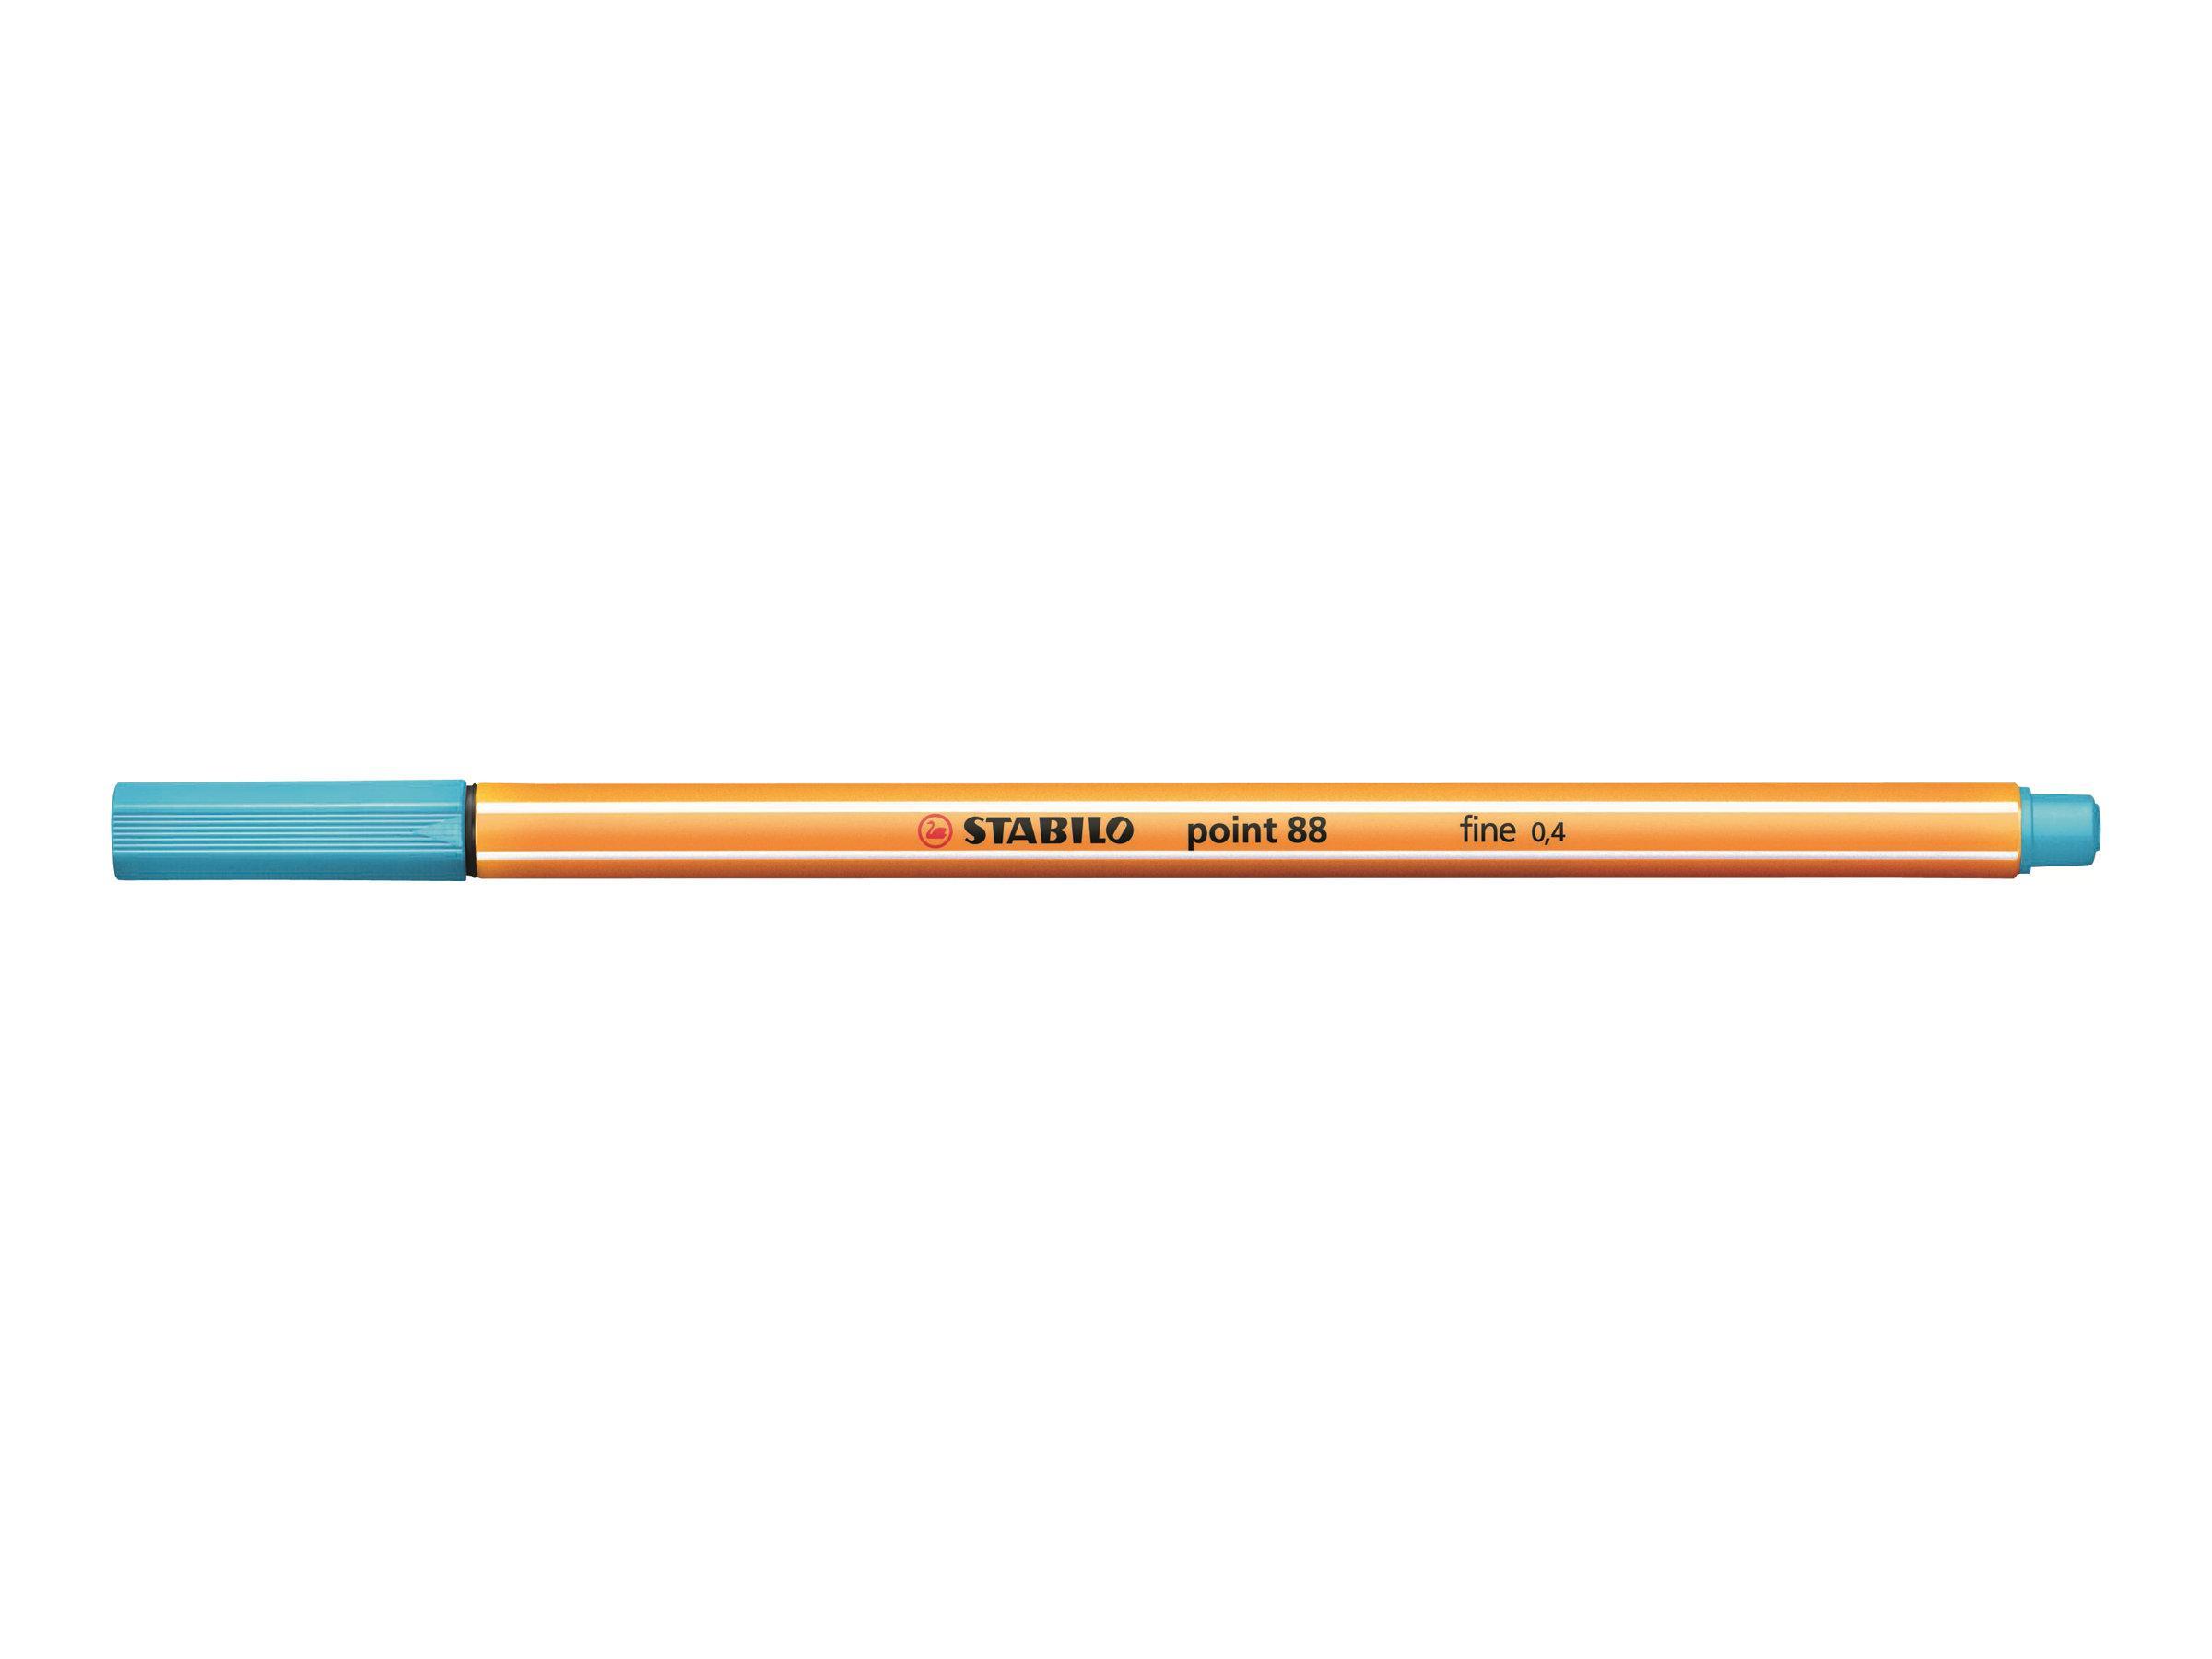 STABILO point 88 - Feutre fin - 0.4 mm - bleu azur